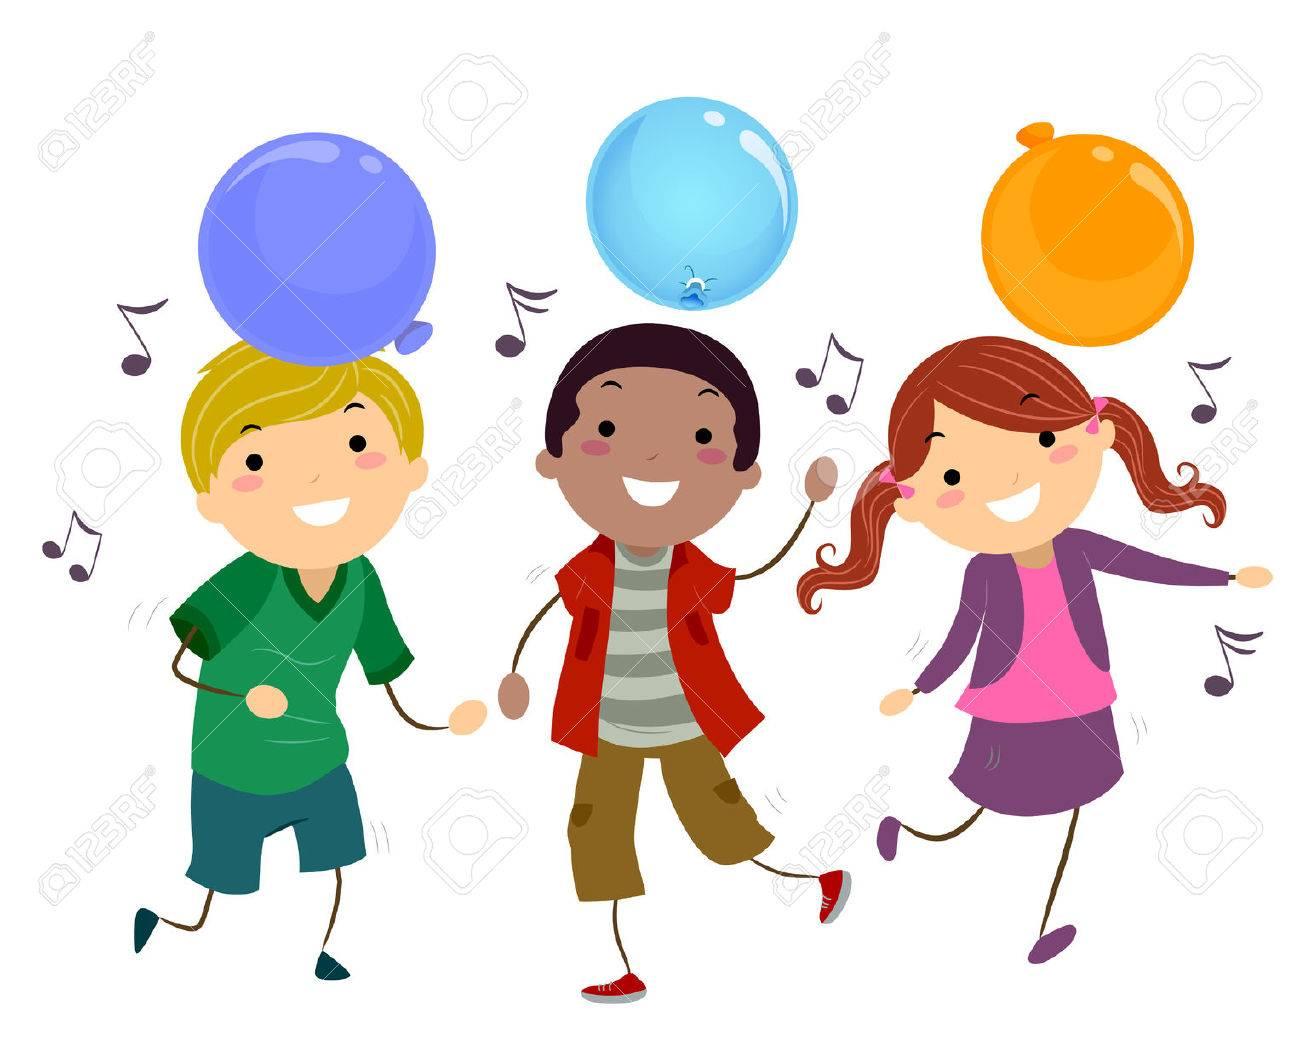 1300x1046 Stickman Illustration Of Kids Dancing To Music Stock Photo